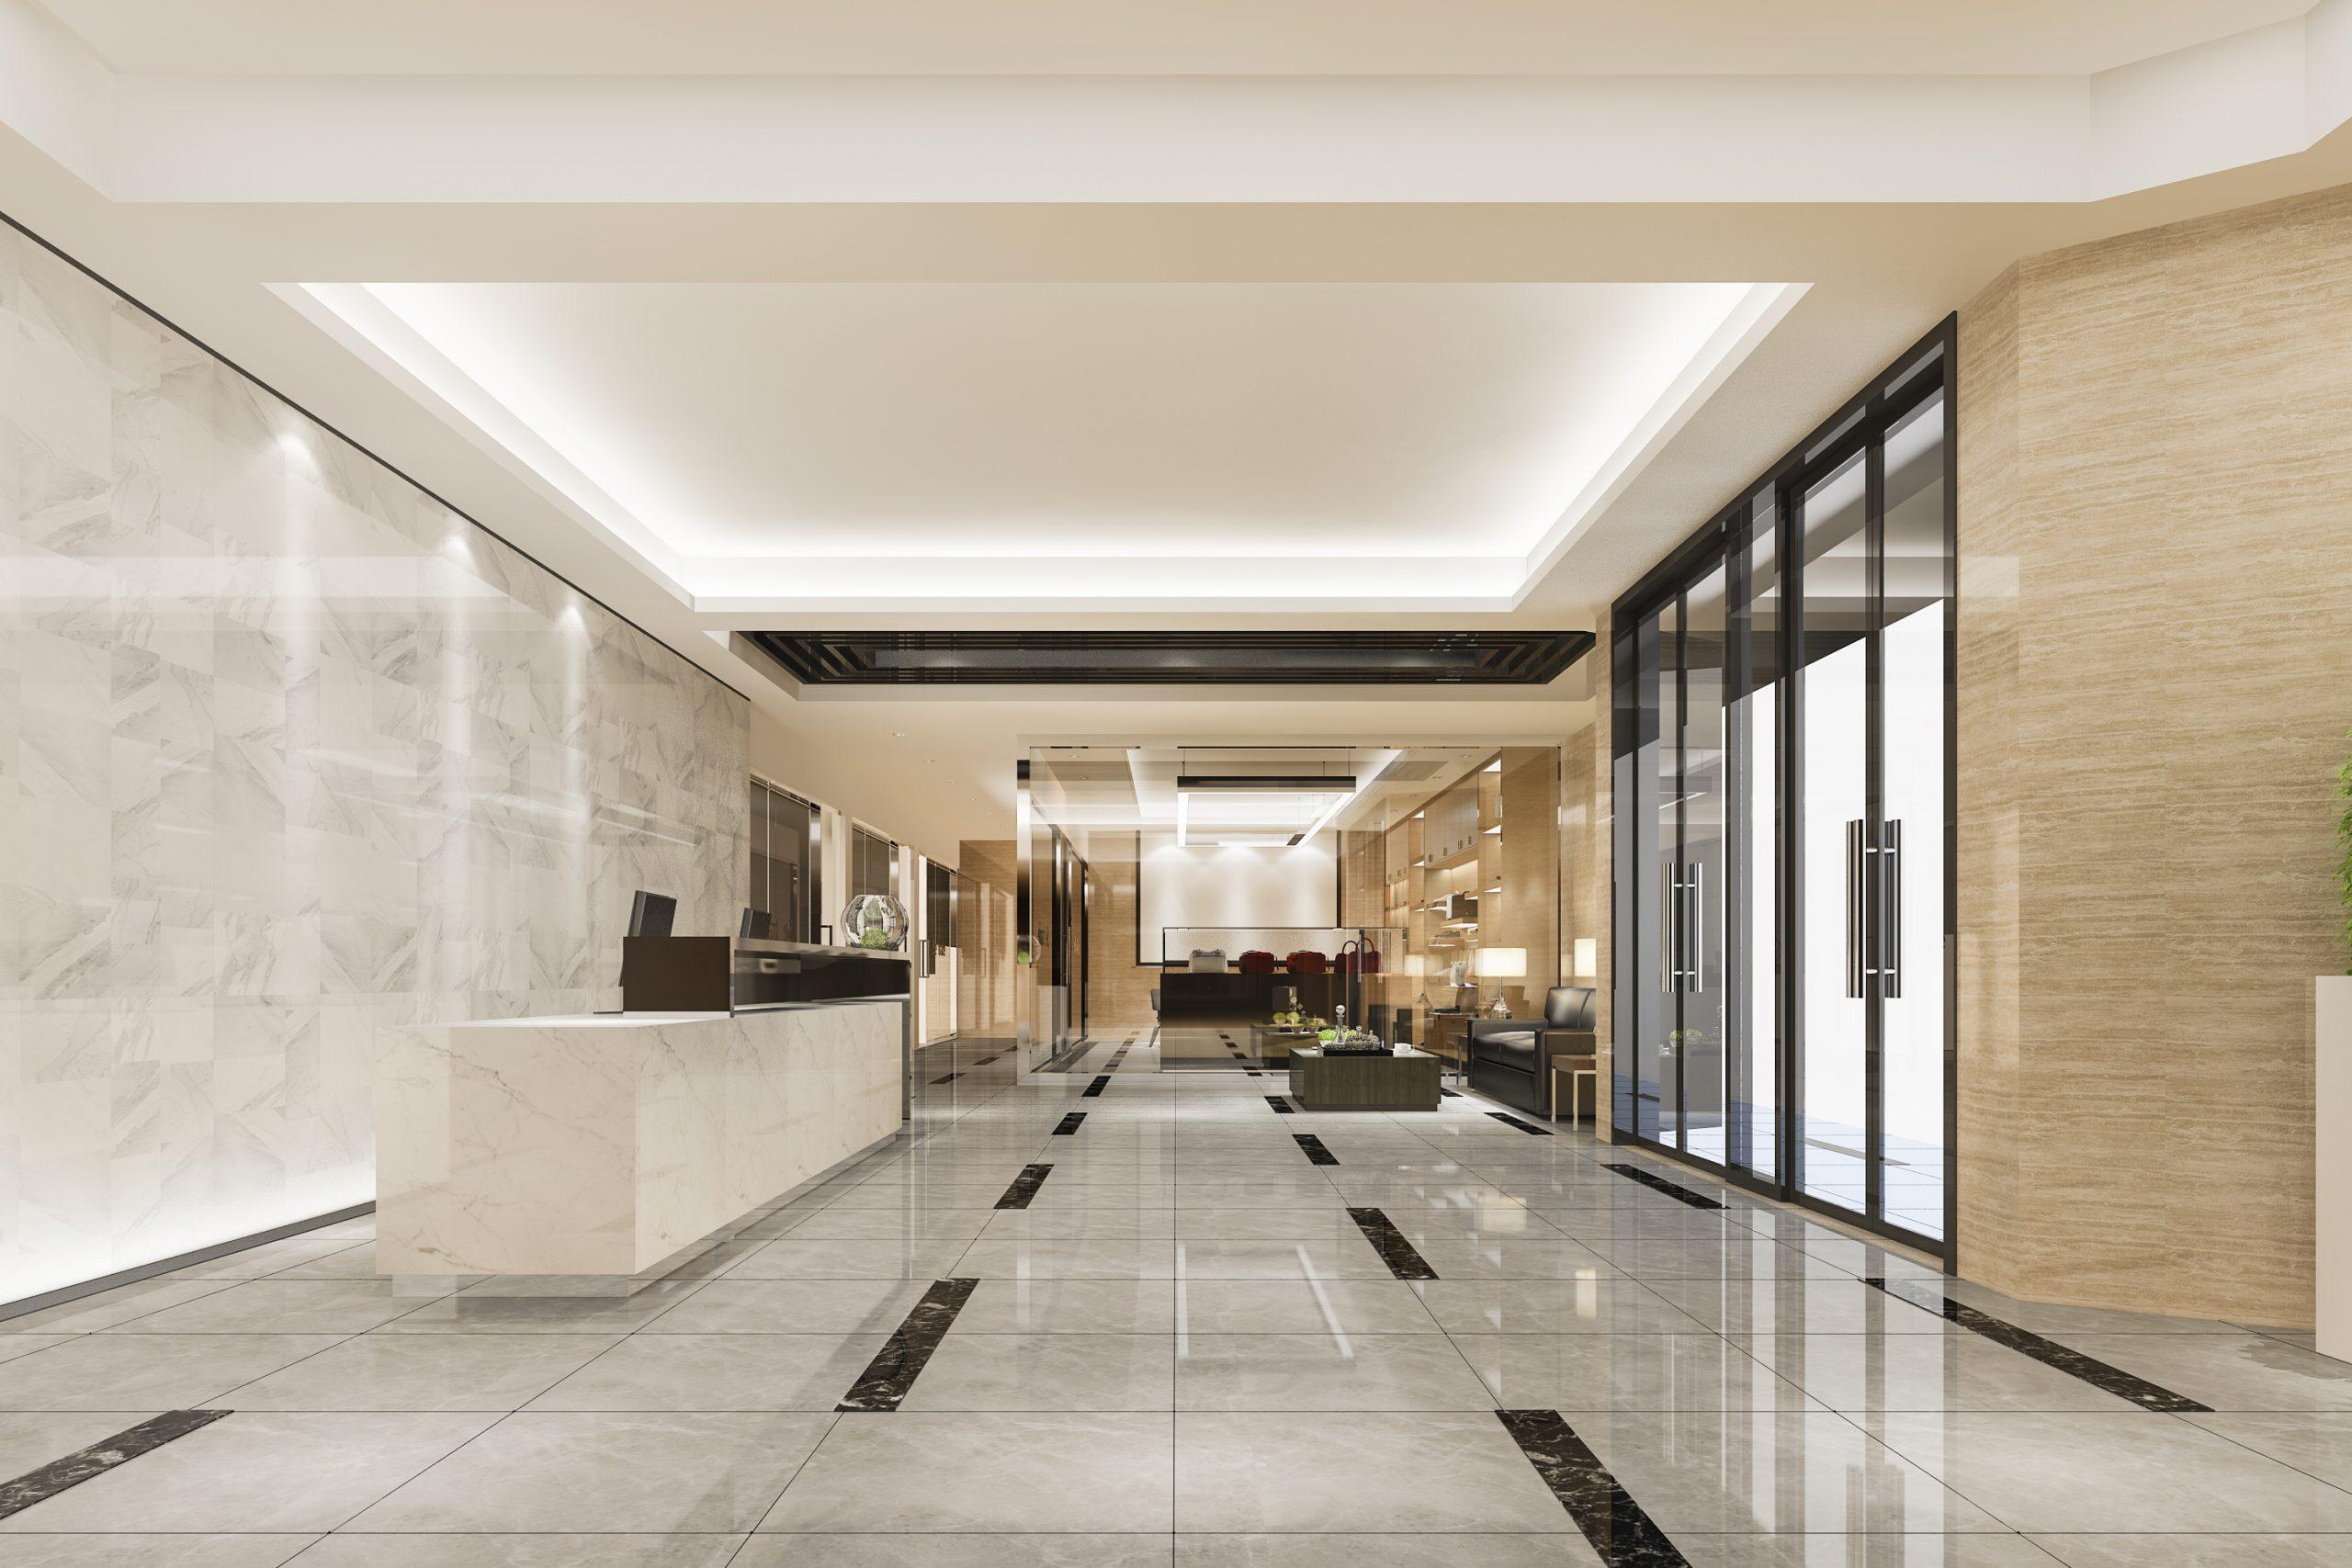 prefab quartz countertops for hotel design